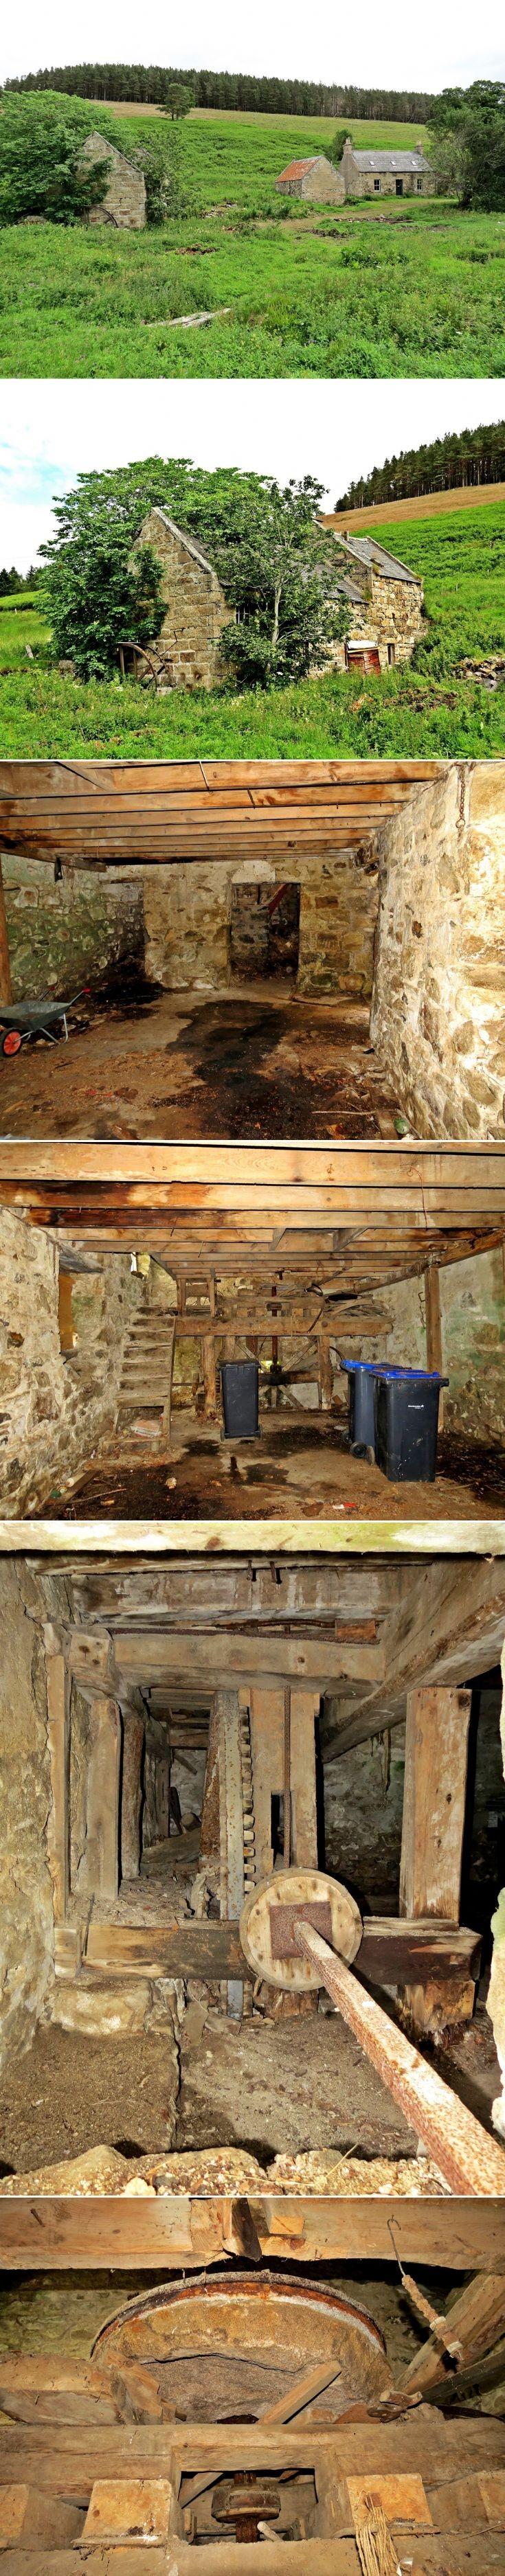 102 Vacant Glenbuchat Mill